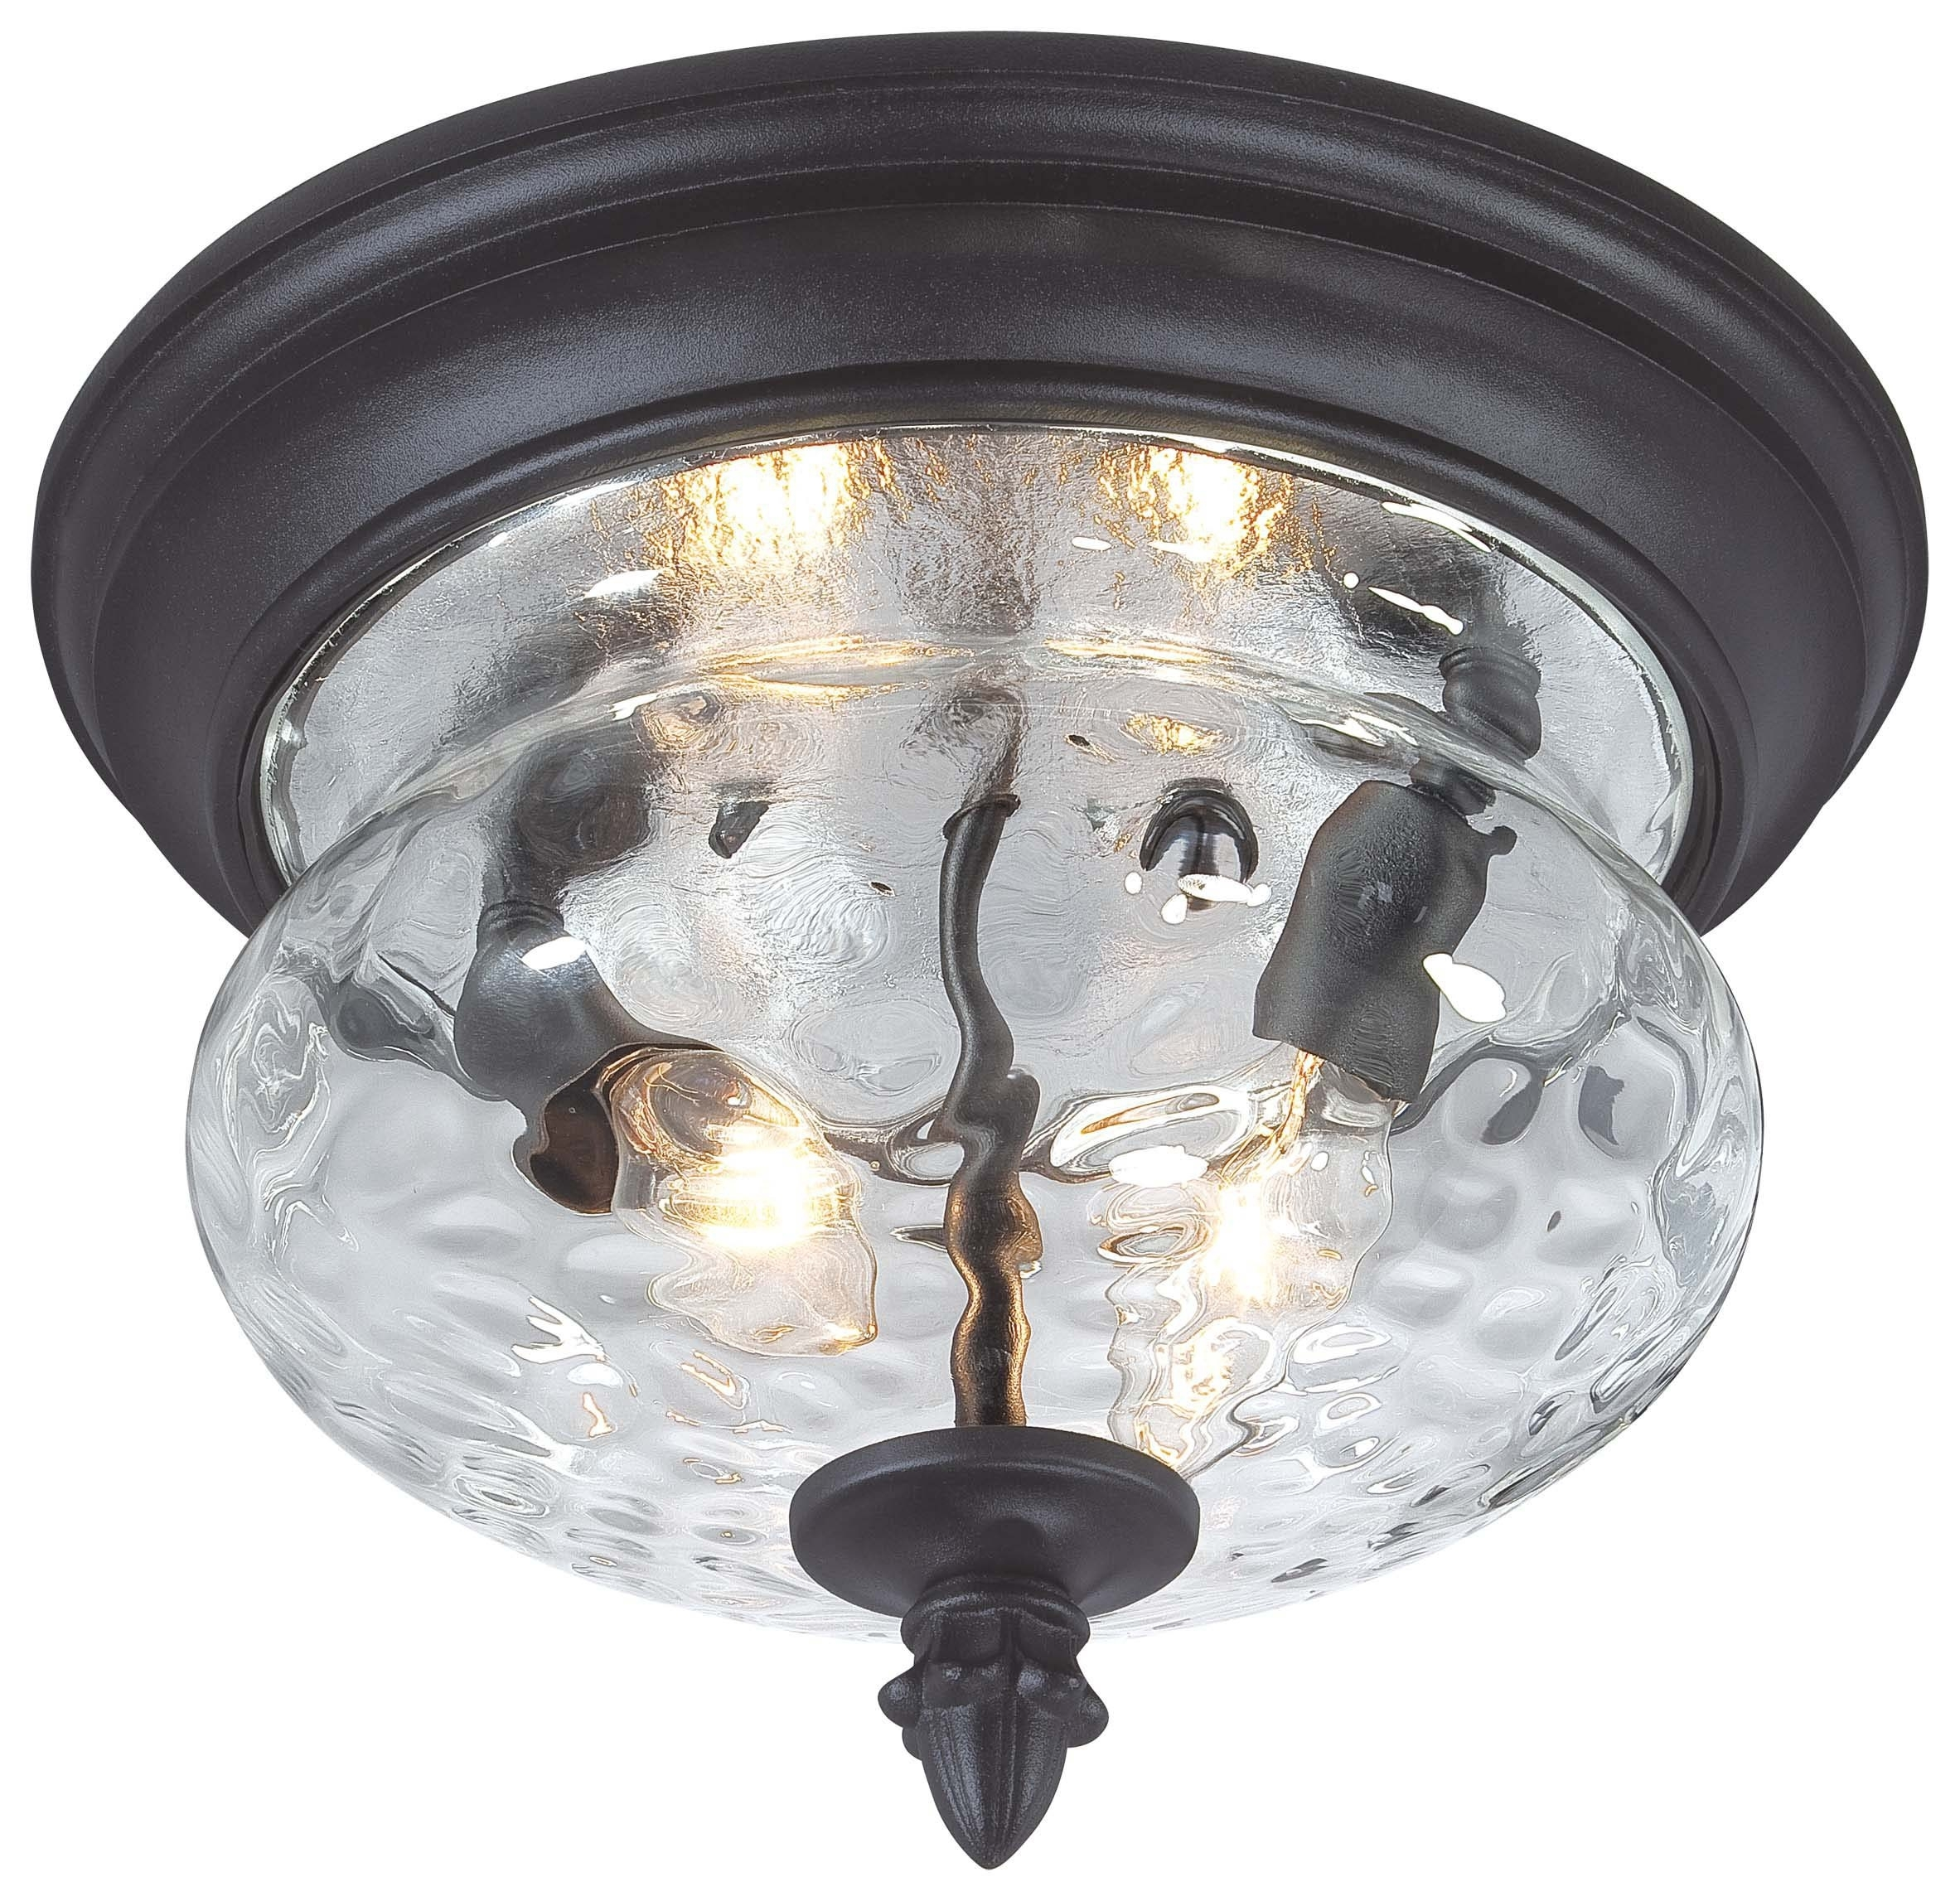 Home Depot Outdoor Pendant Lights #23595 | Astonbkk With Regard To Outdoor Ceiling Lights At Home Depot (#8 of 15)